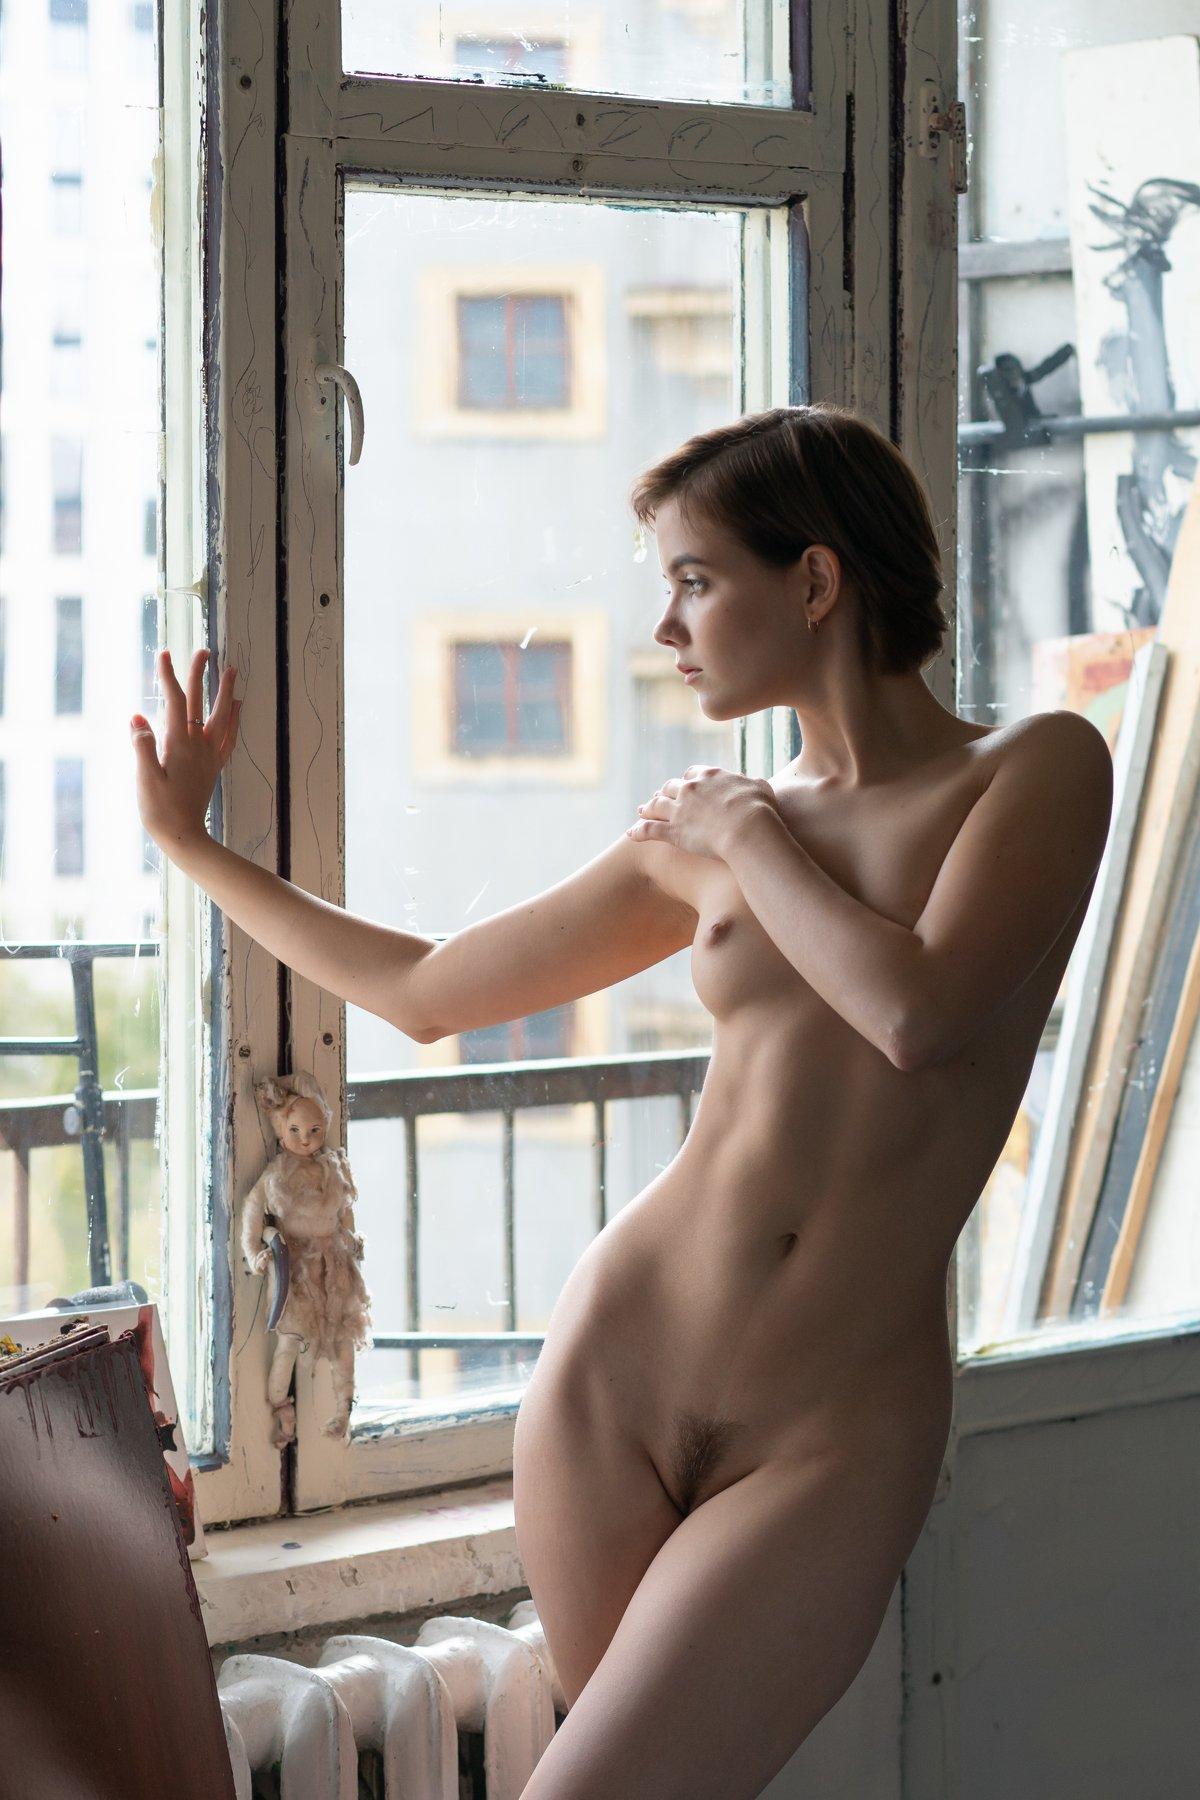 posing, sexy, skin, woman, nude, girl, female, model, beautiful, body, beauty, sensual, young, adult, attractive, white, naked, caucasian, studio, sensuality, healthy, human, lady, elegance, portrait, pretty, figure, elegant, hair, erotic, Smirnoff Igor